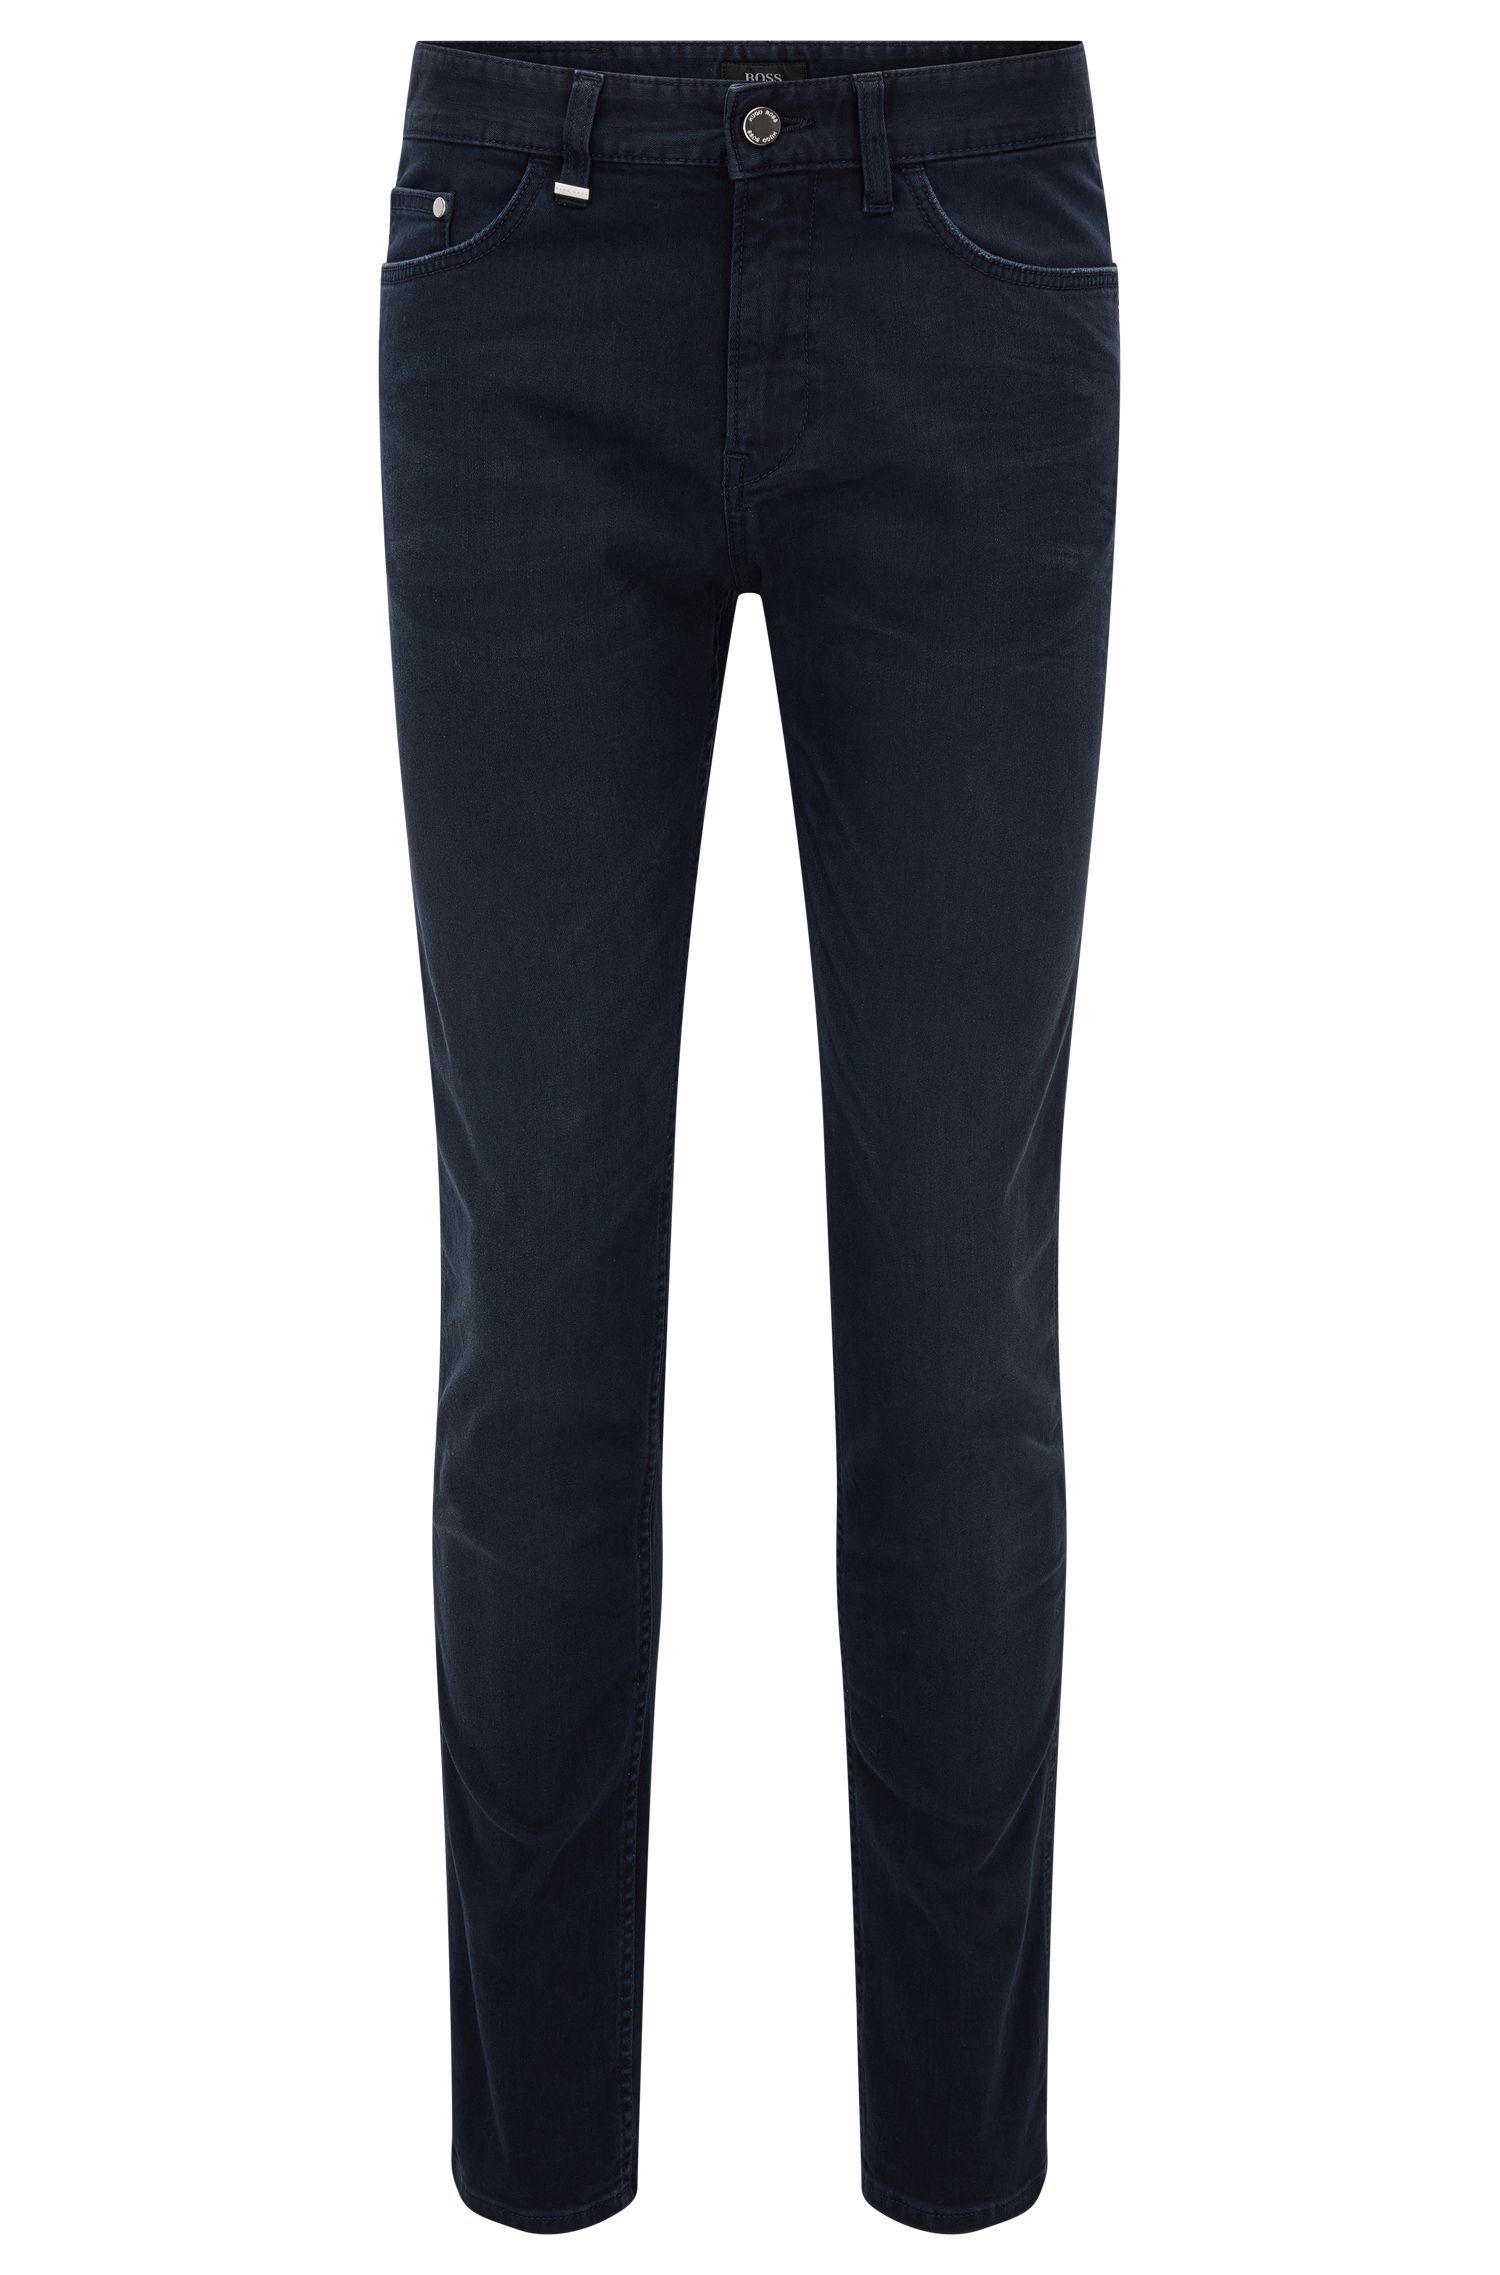 Jeans Slim Fit en denim stretch, gris-bleu